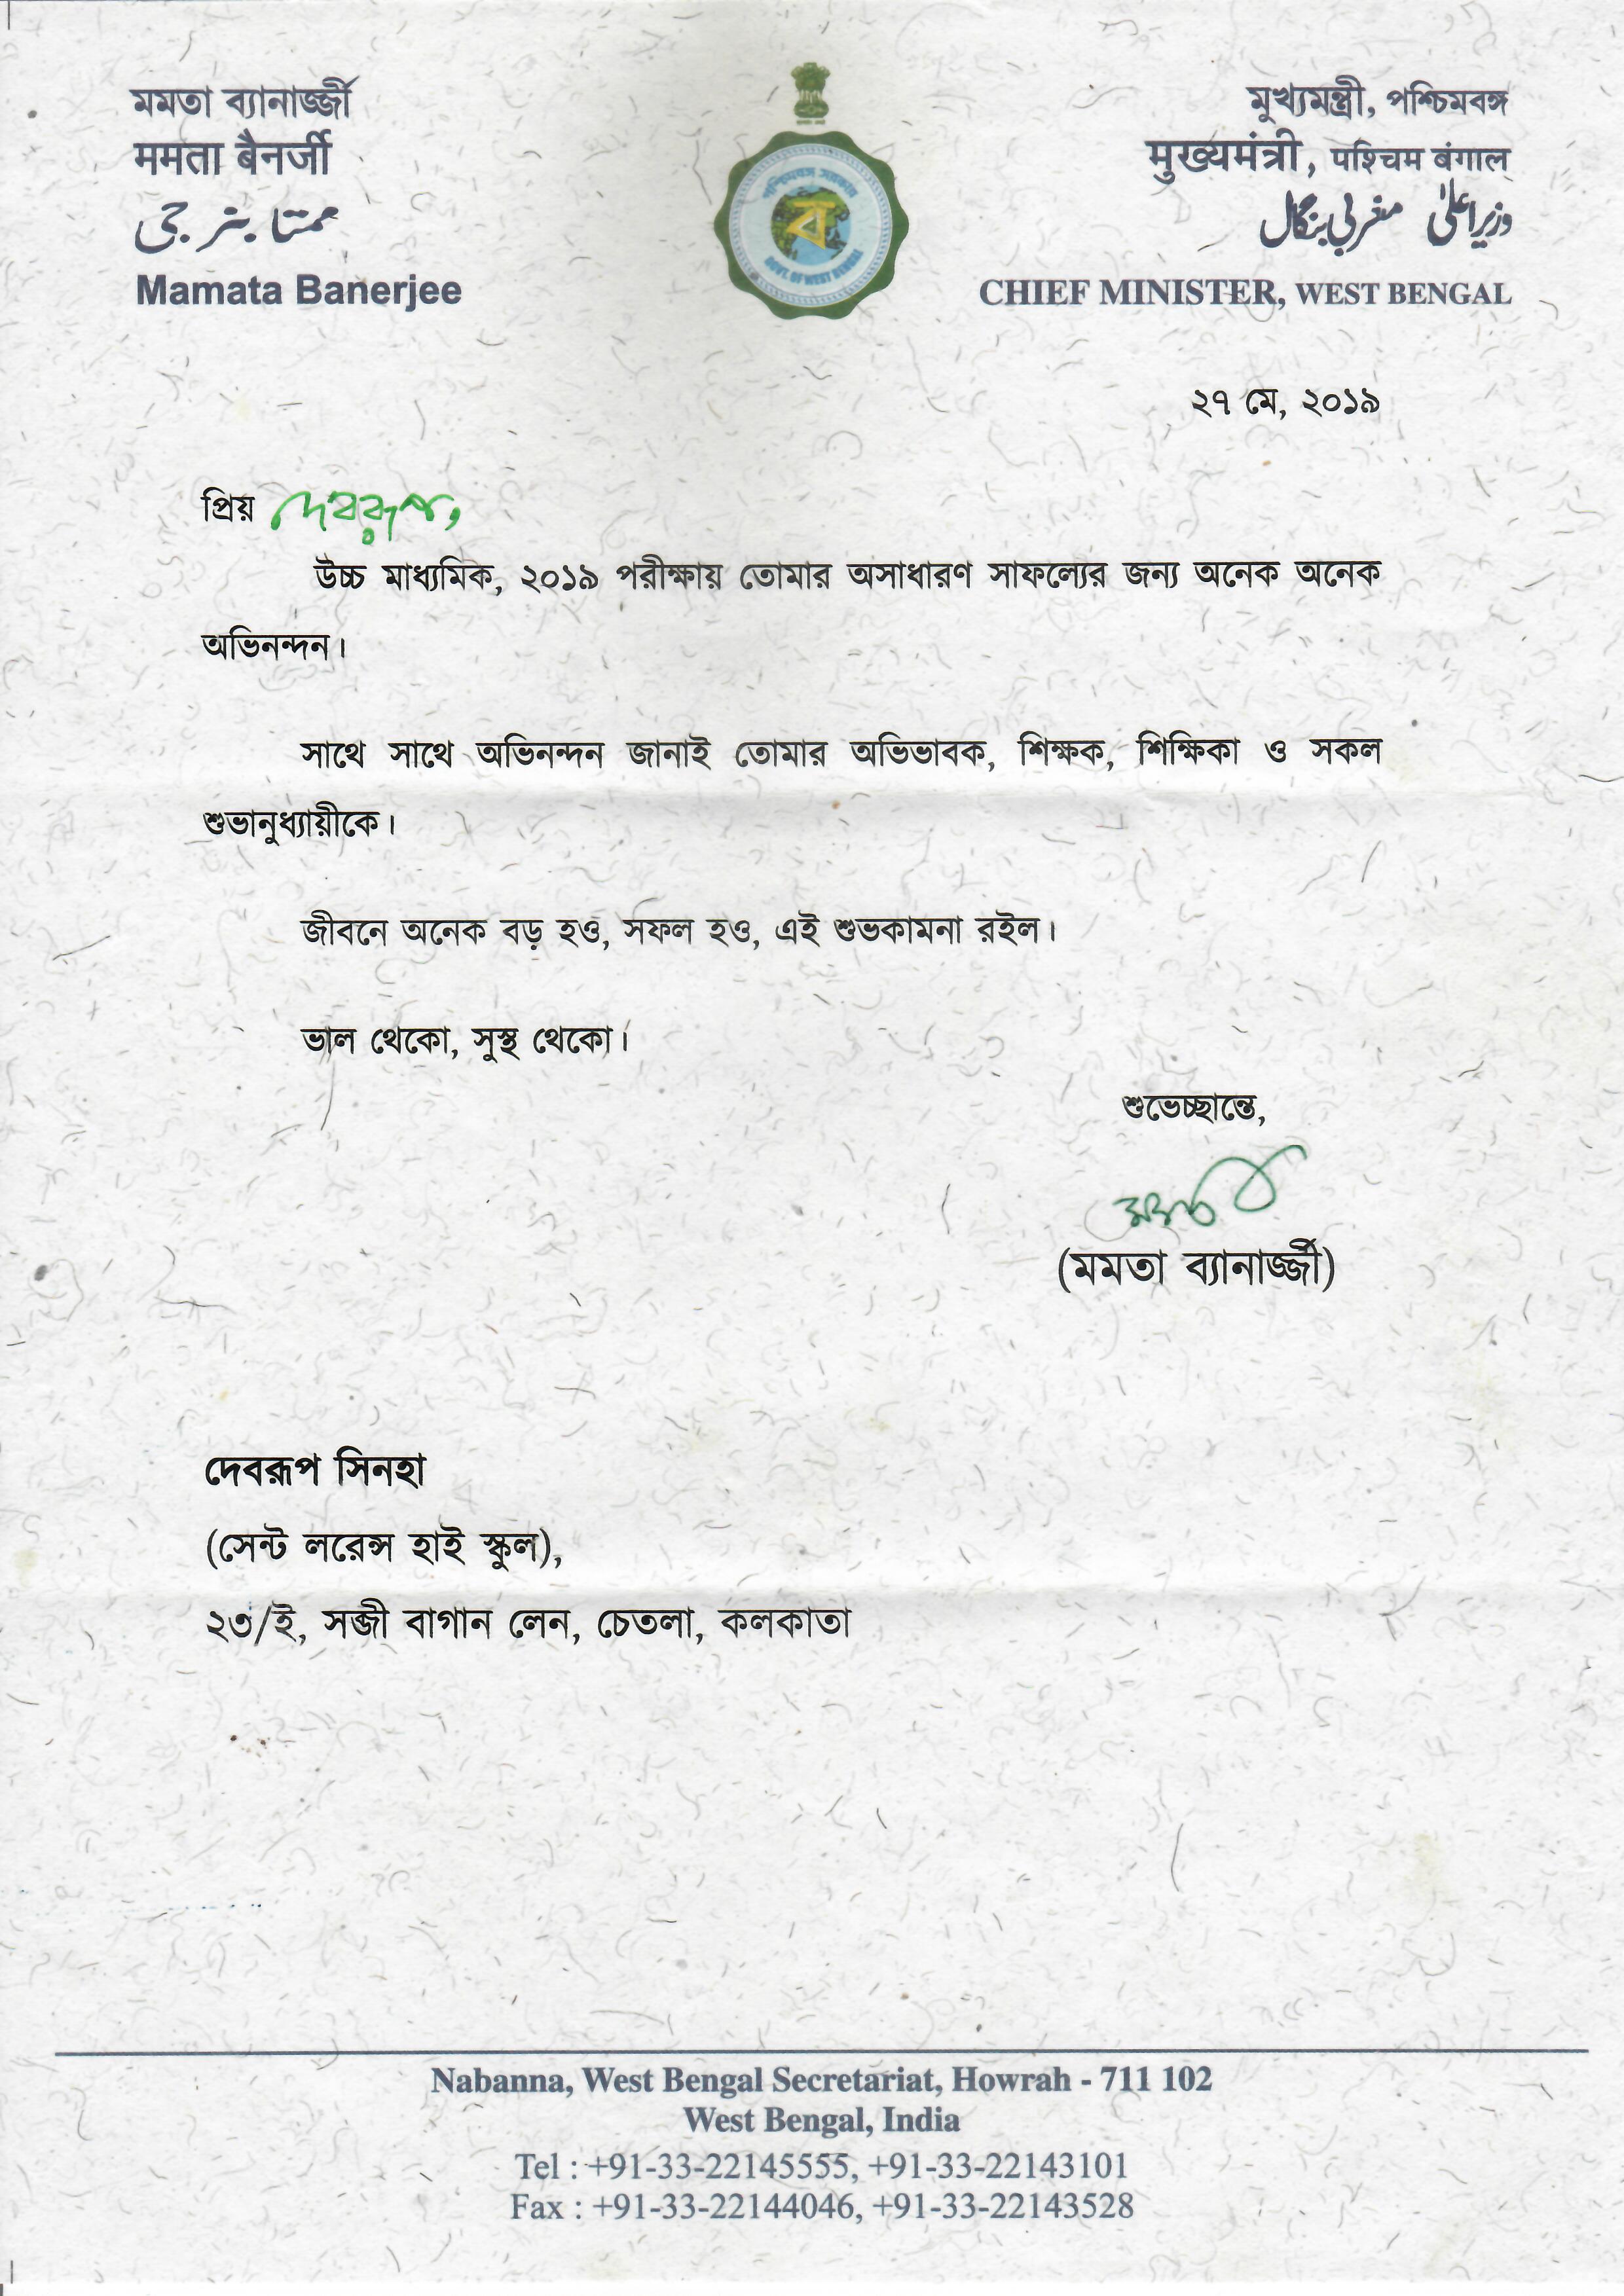 letter from mamta